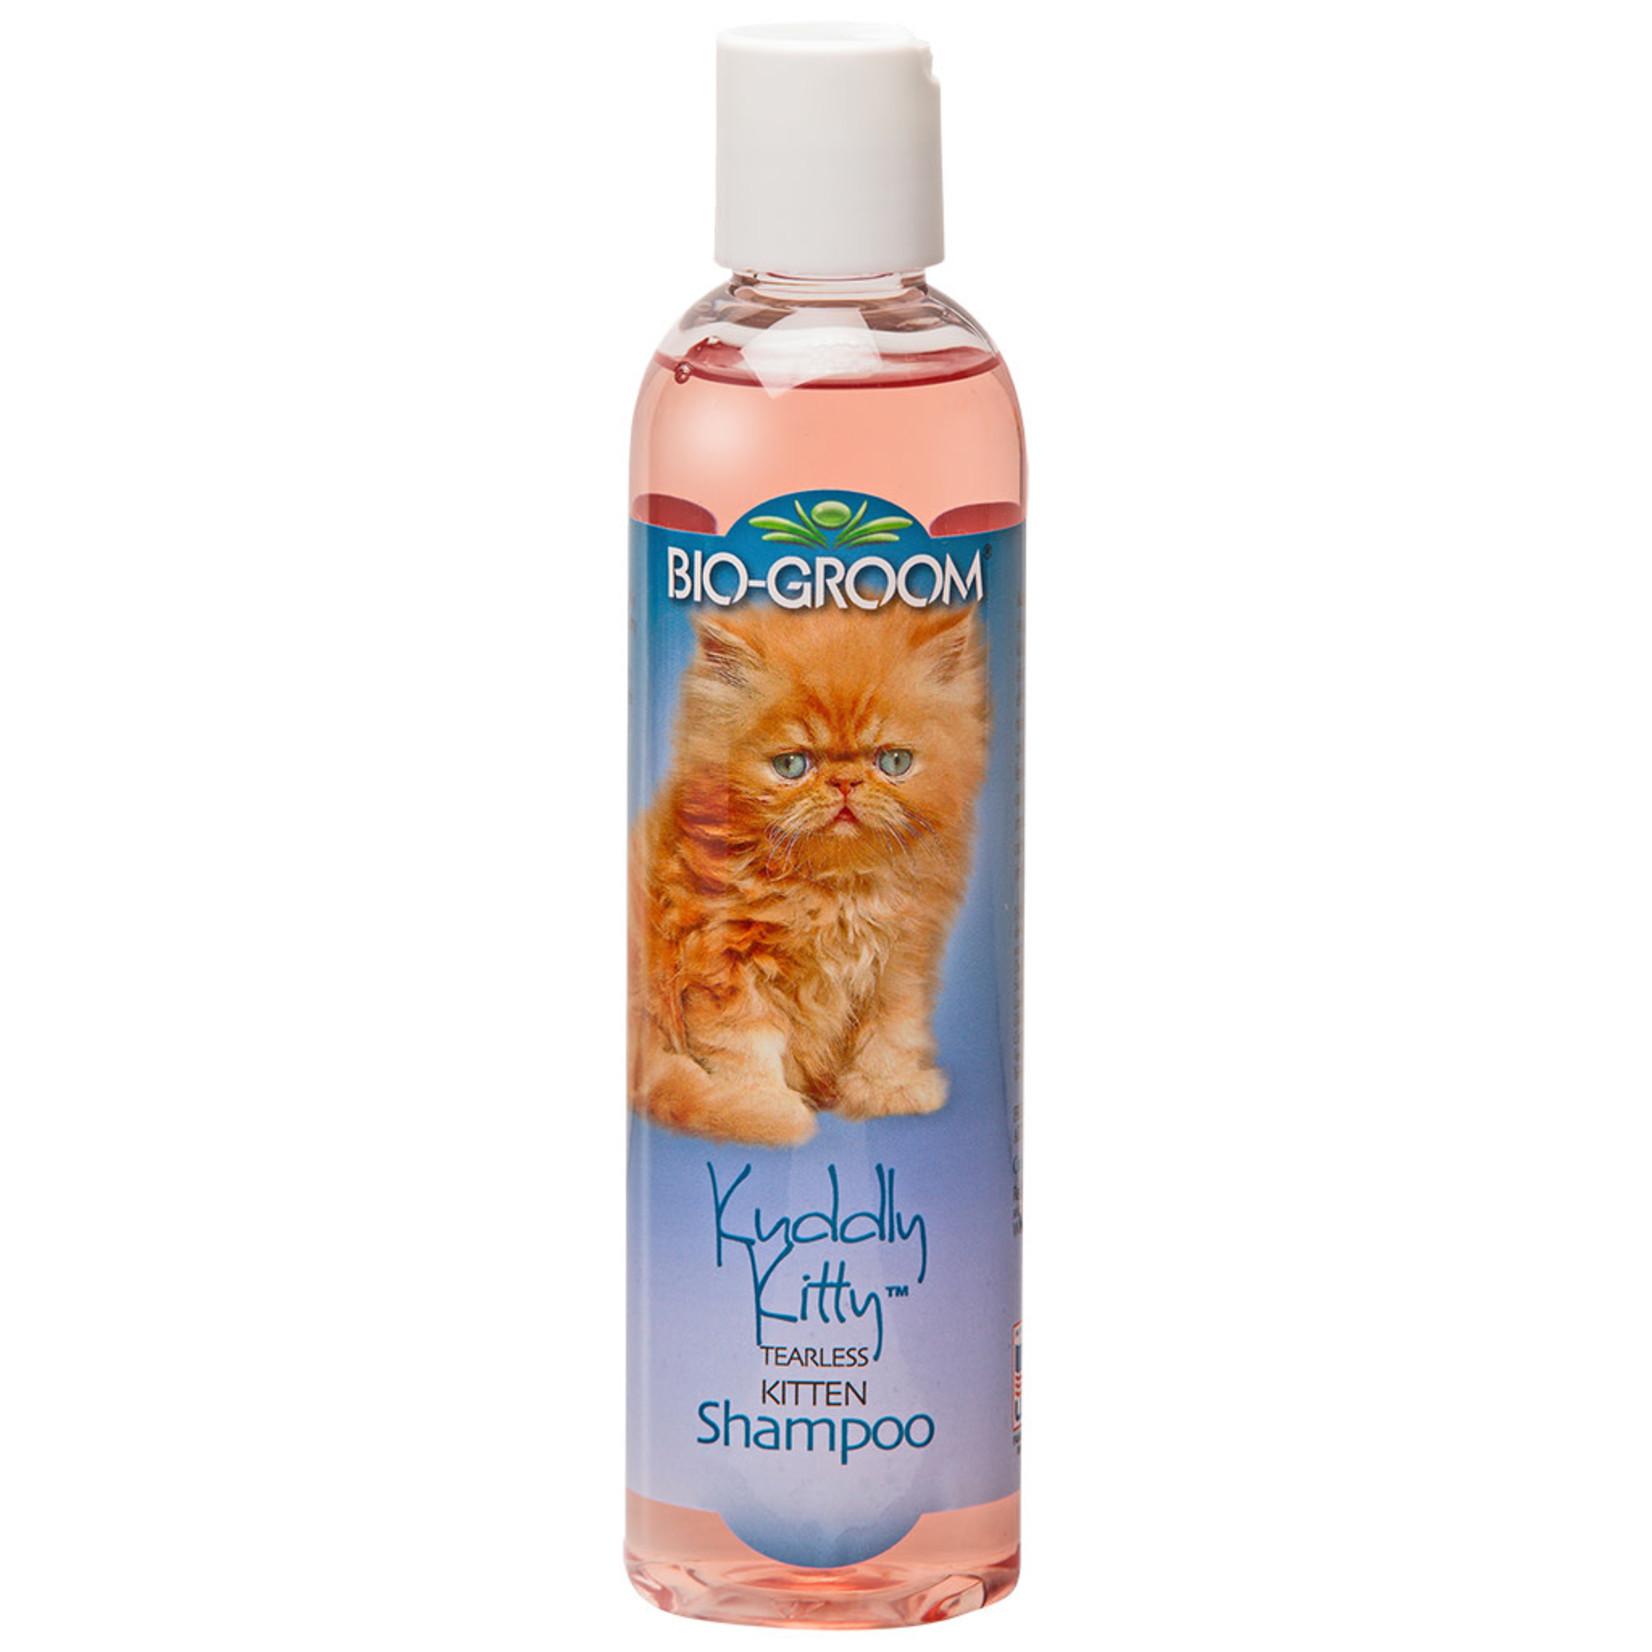 Bio Groom Kitten Shampoo 8oz